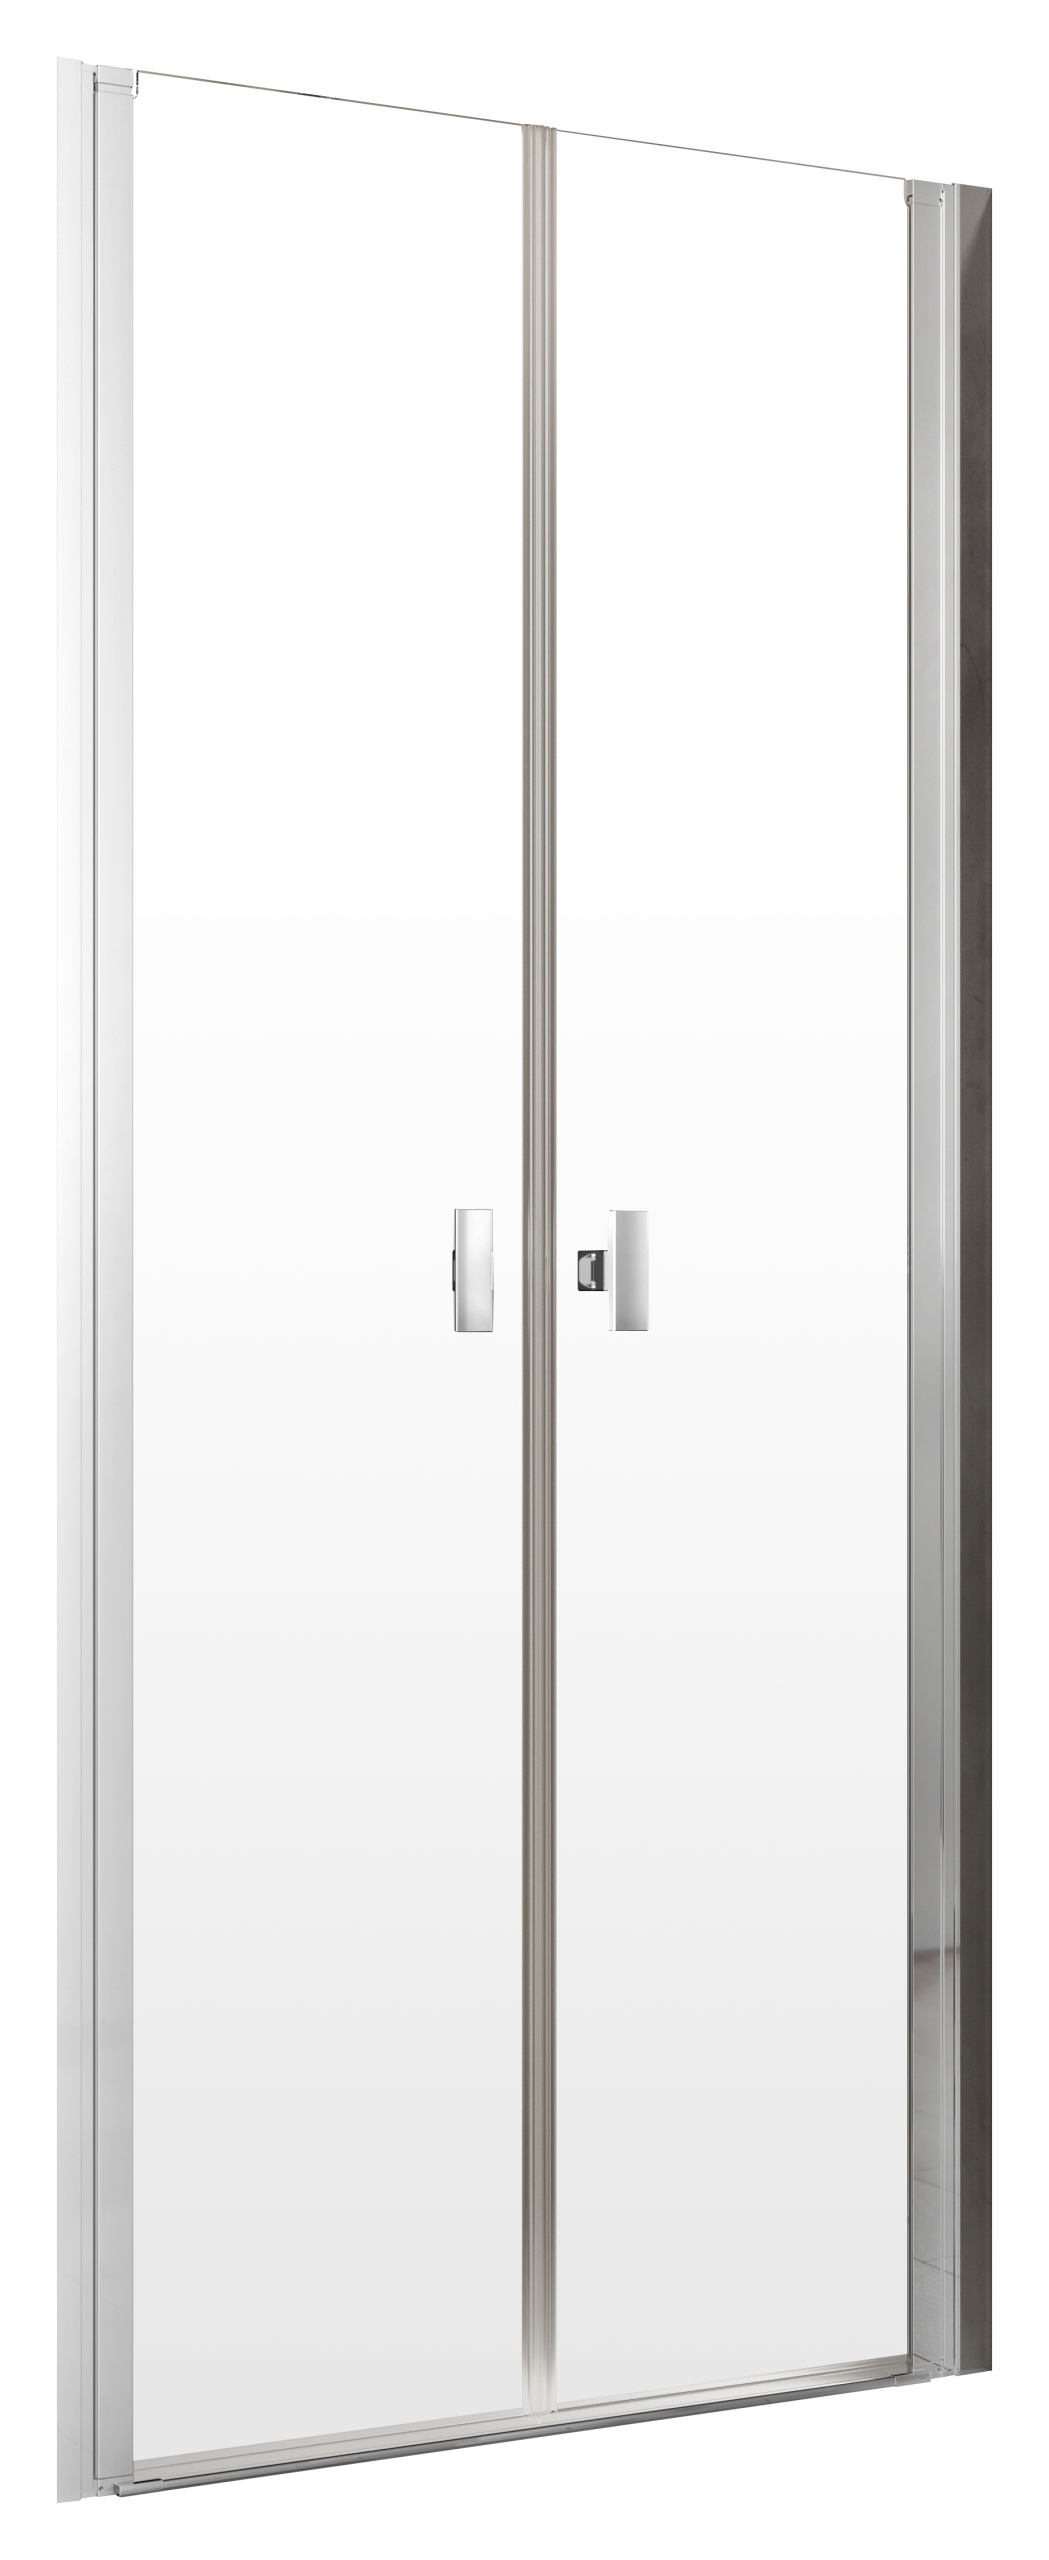 NES DWD I sprchové dvere 70x200 cm RADAWAY